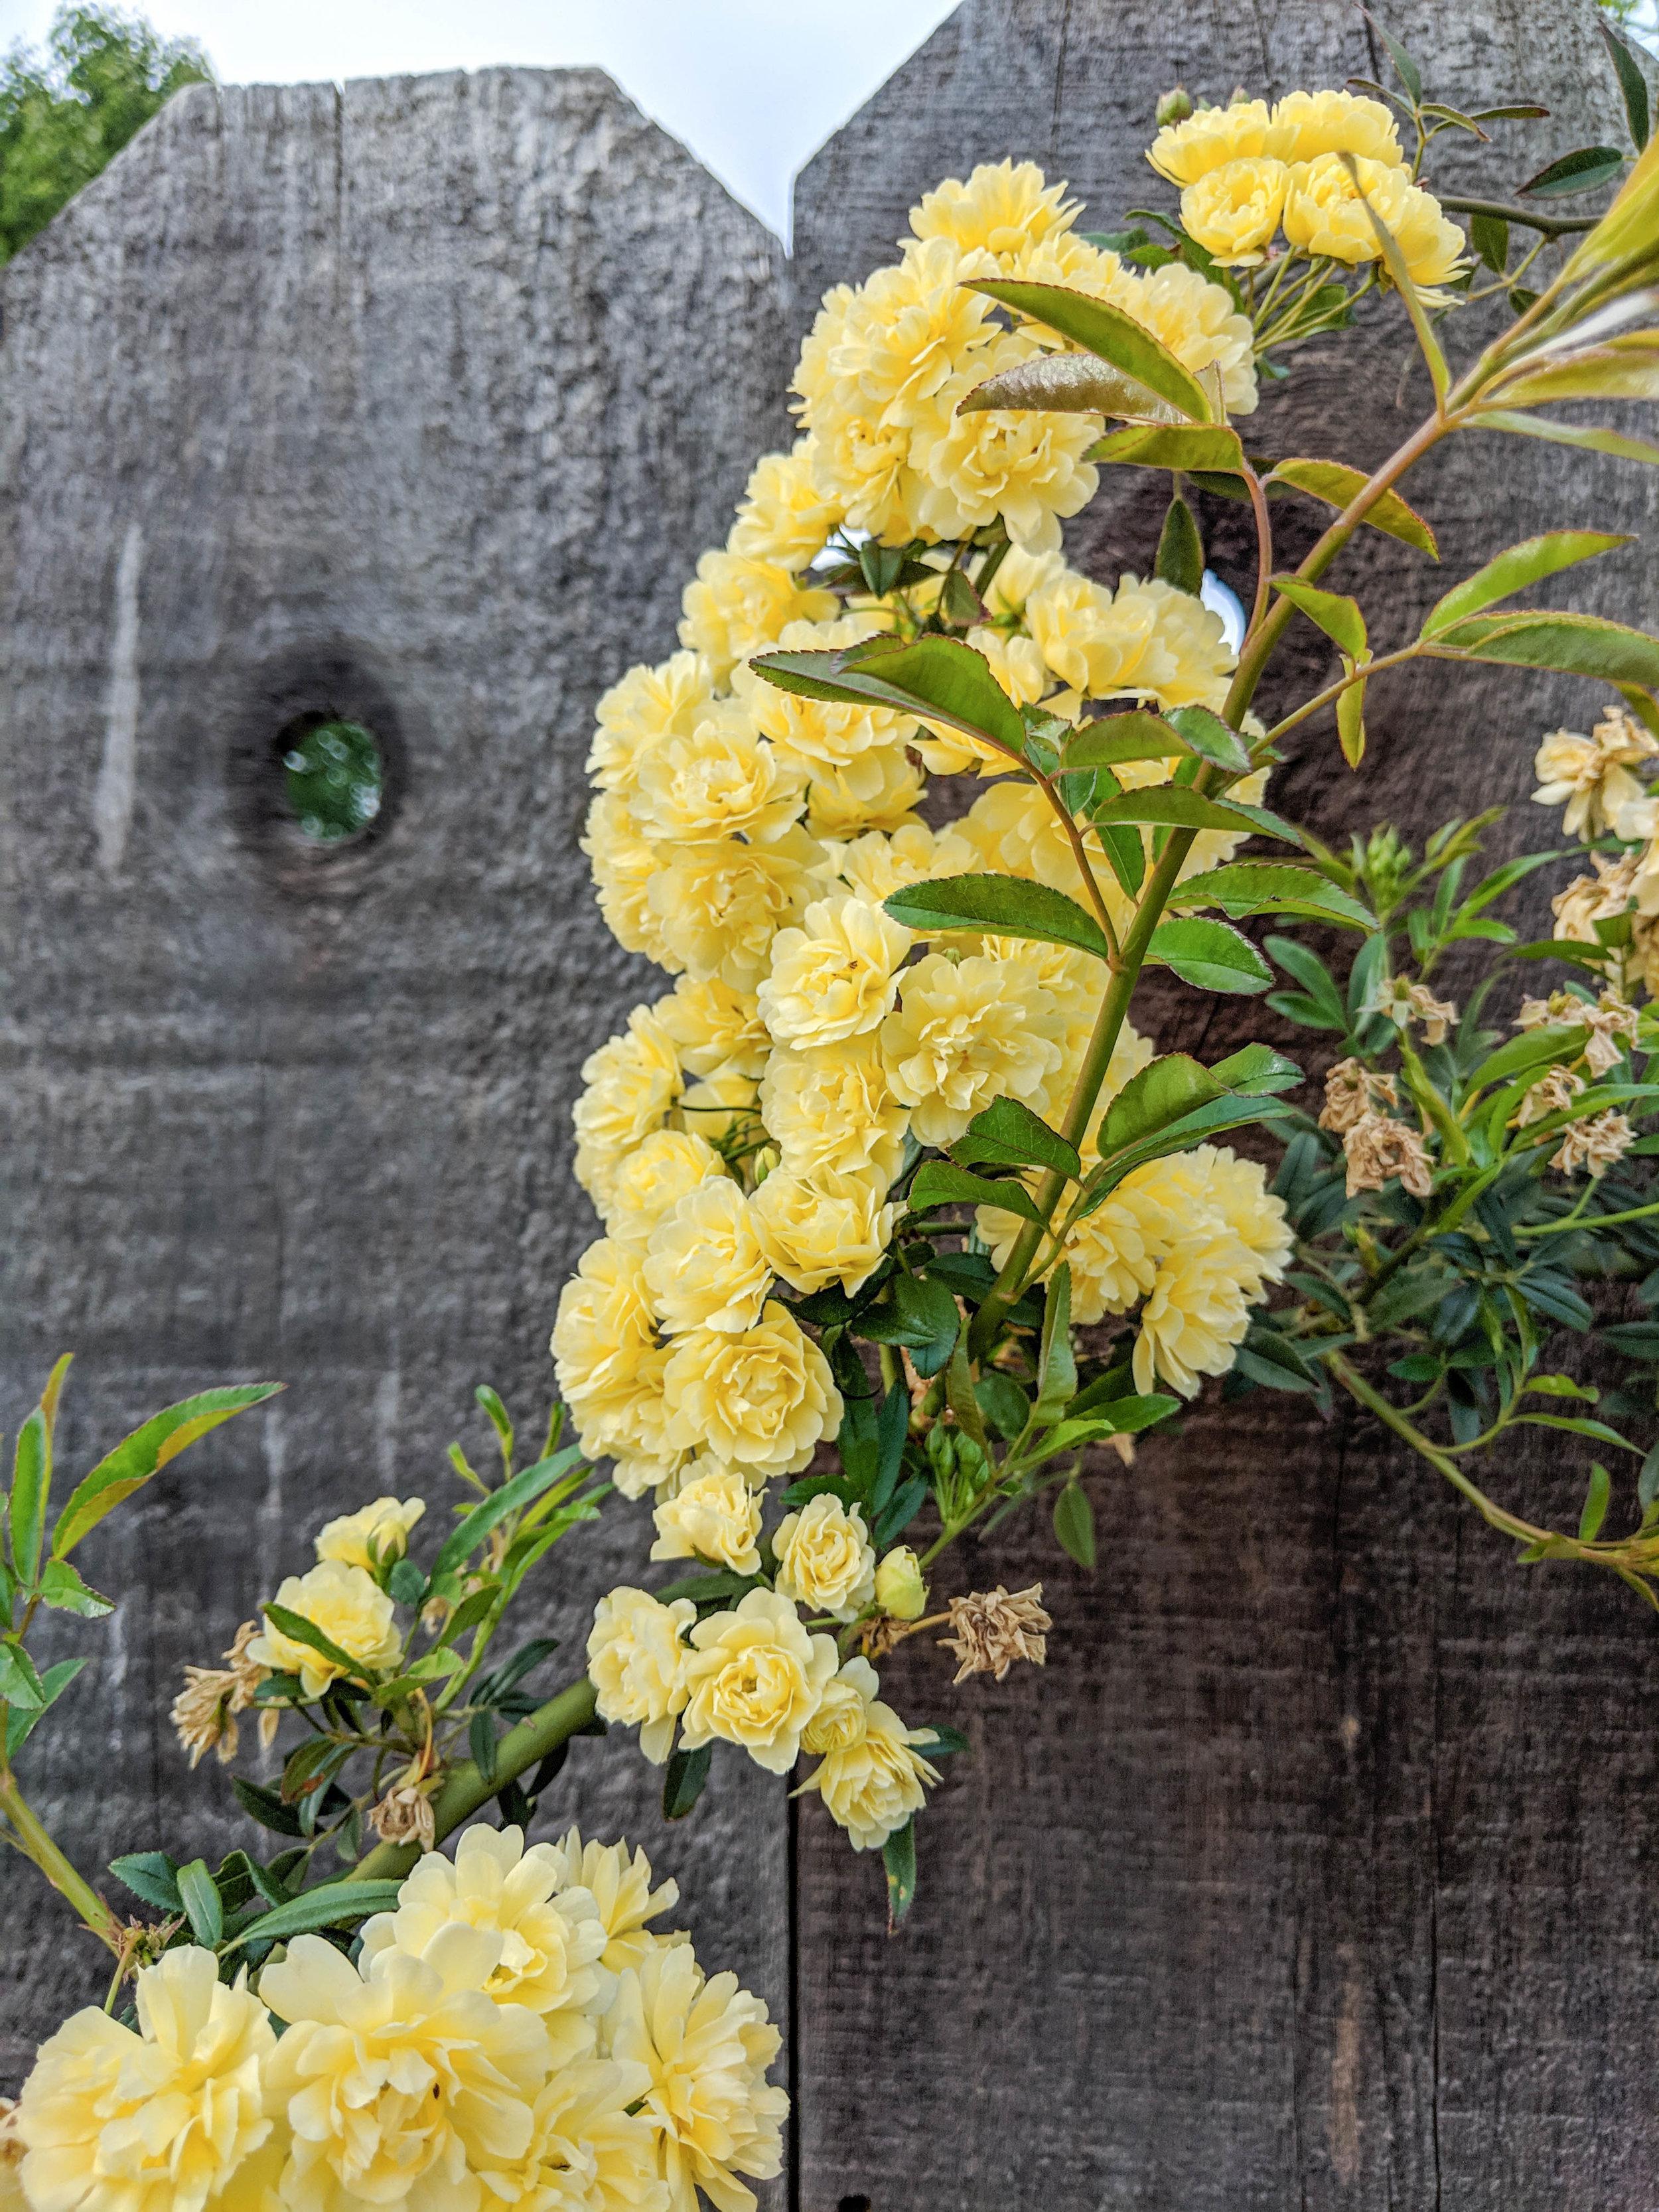 bri rinehart; photography; photography series; spring; flowers